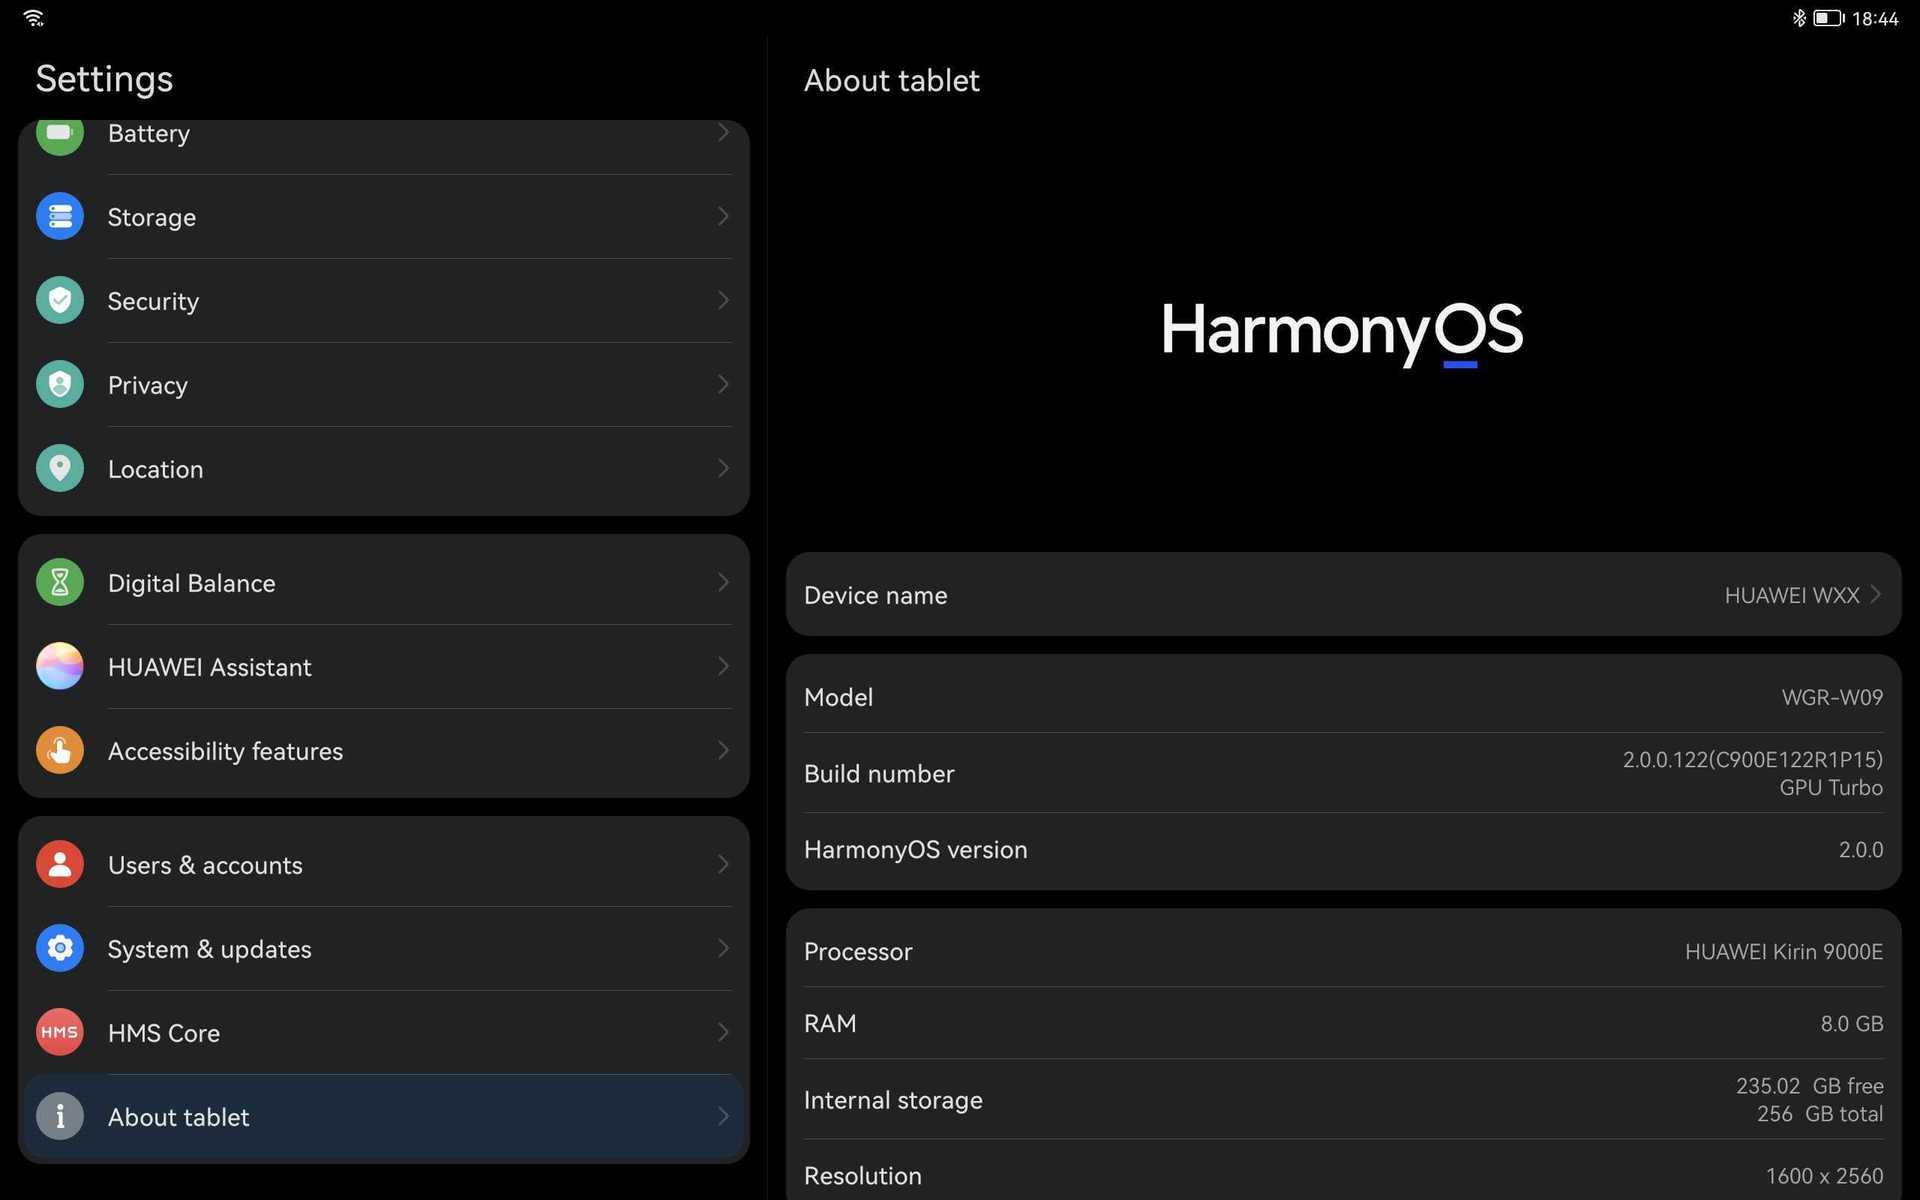 harmony os screenshot settings example 1